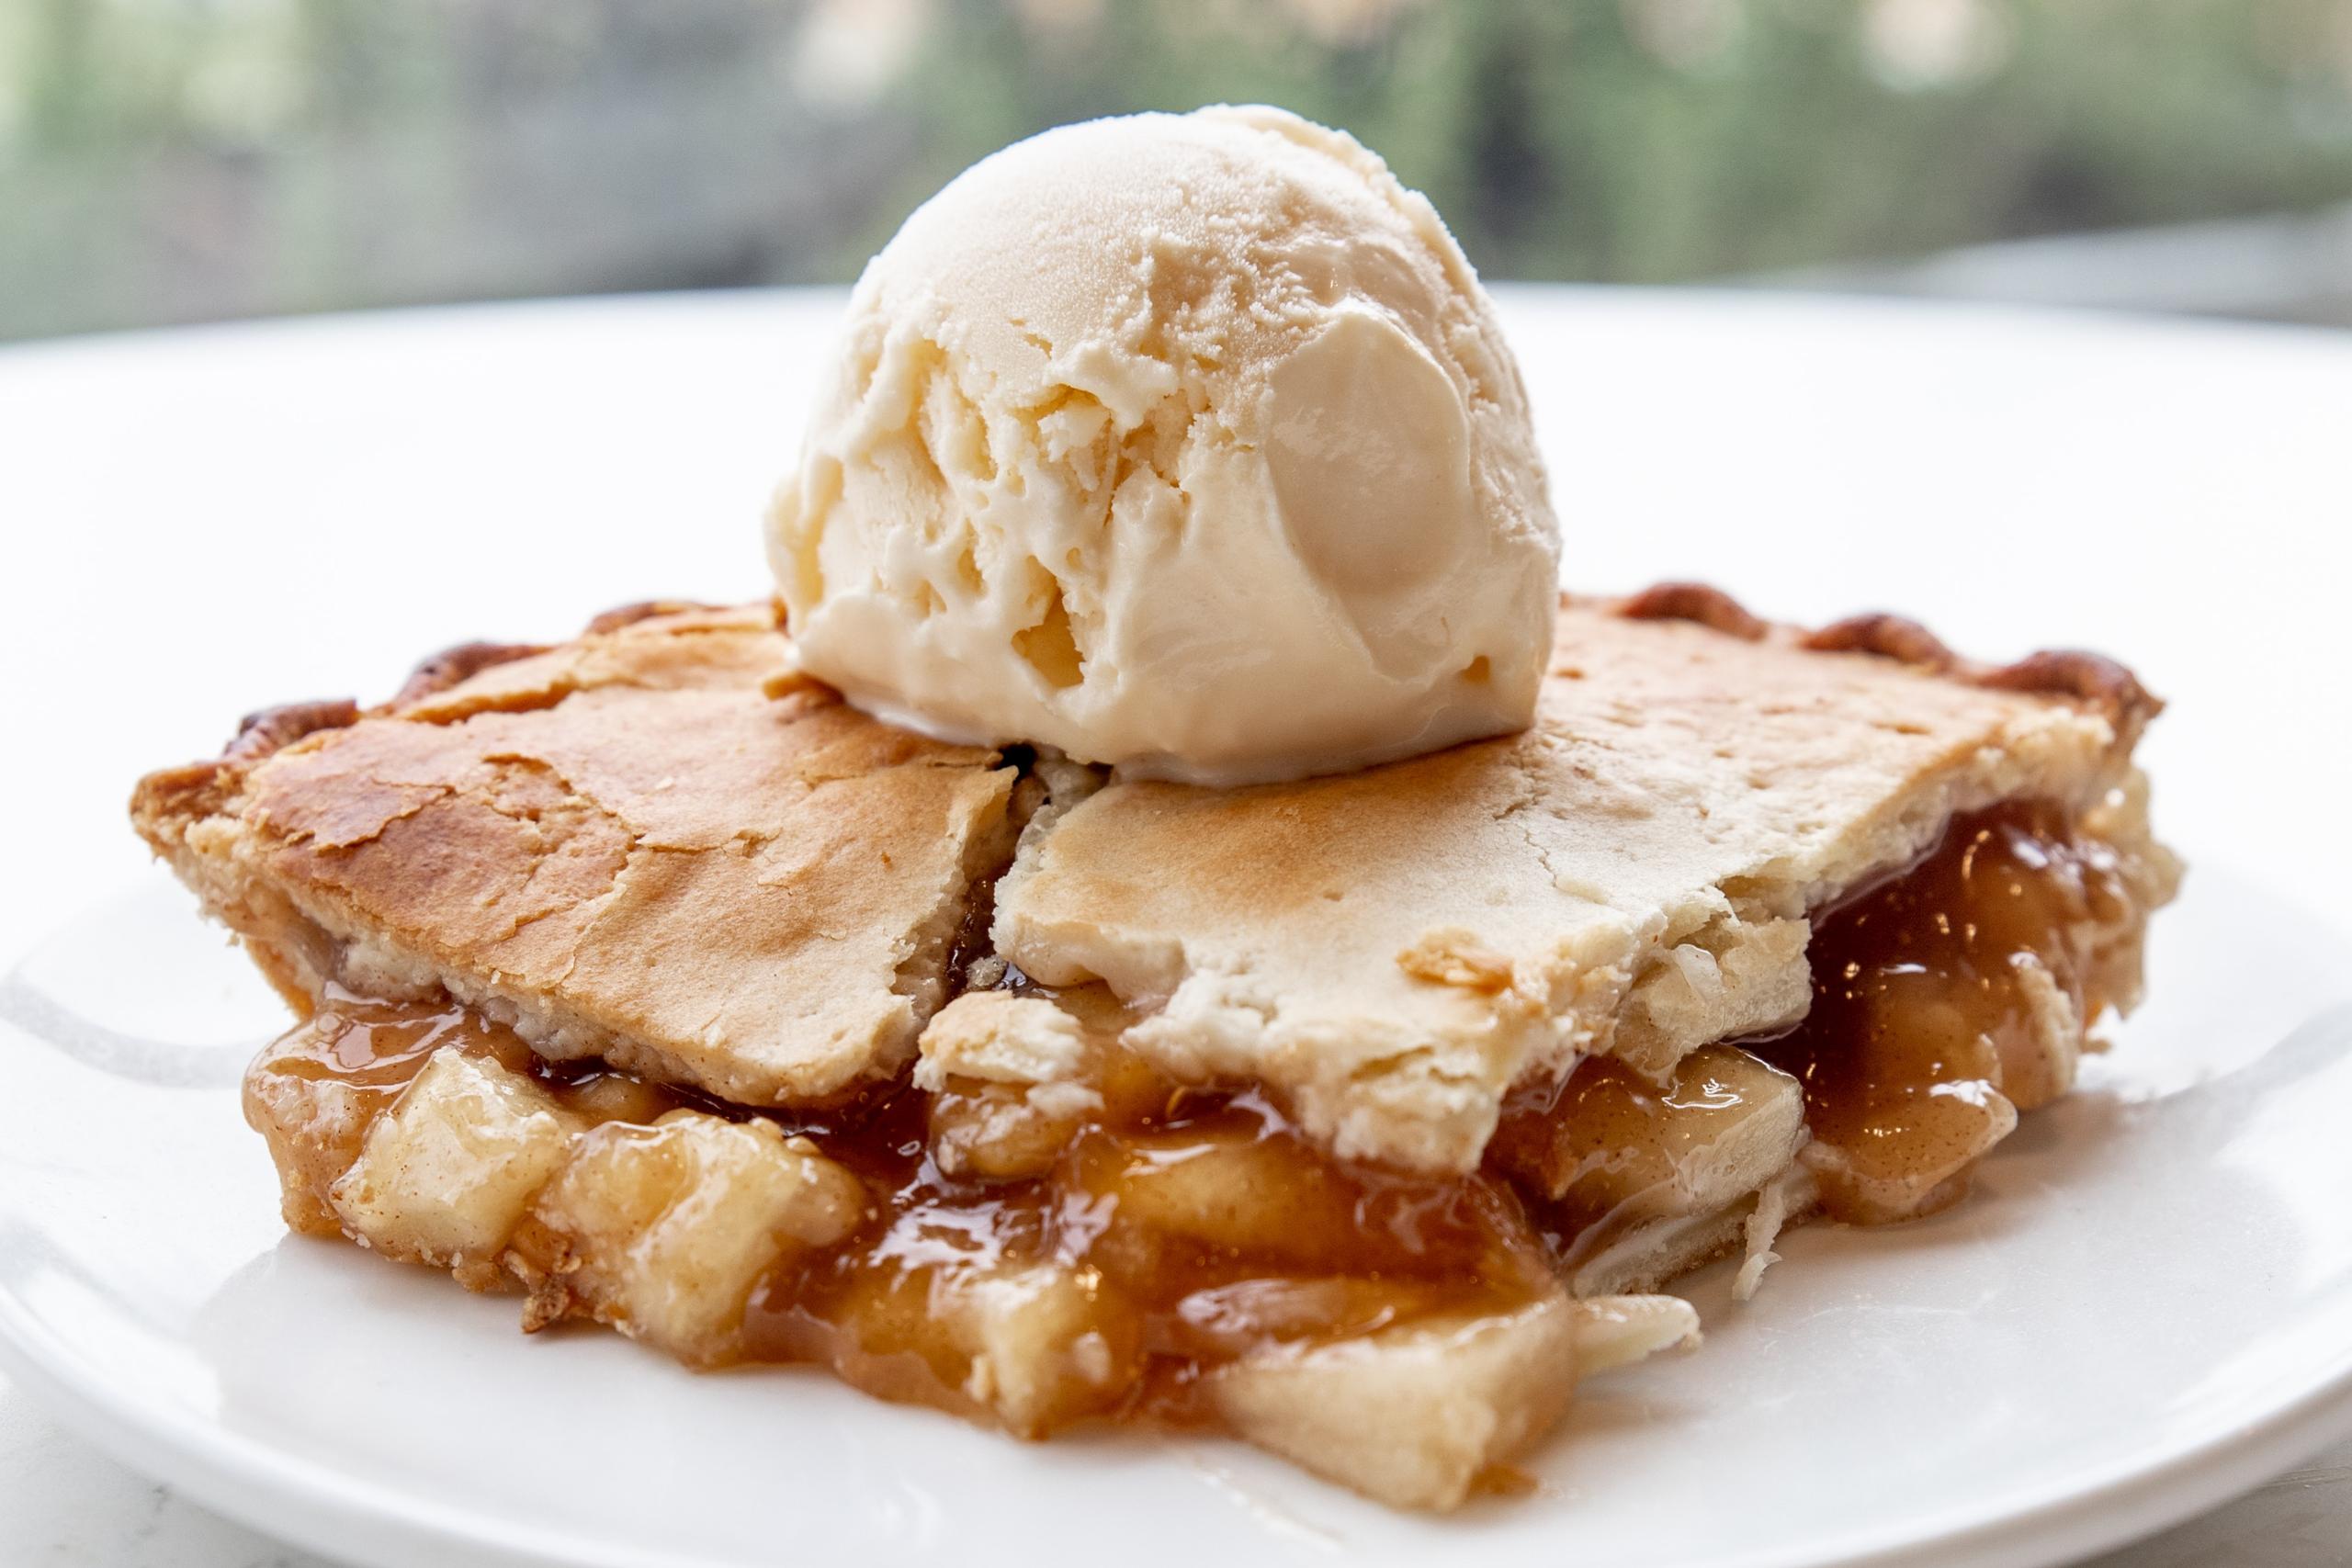 harpers delicious apple pie